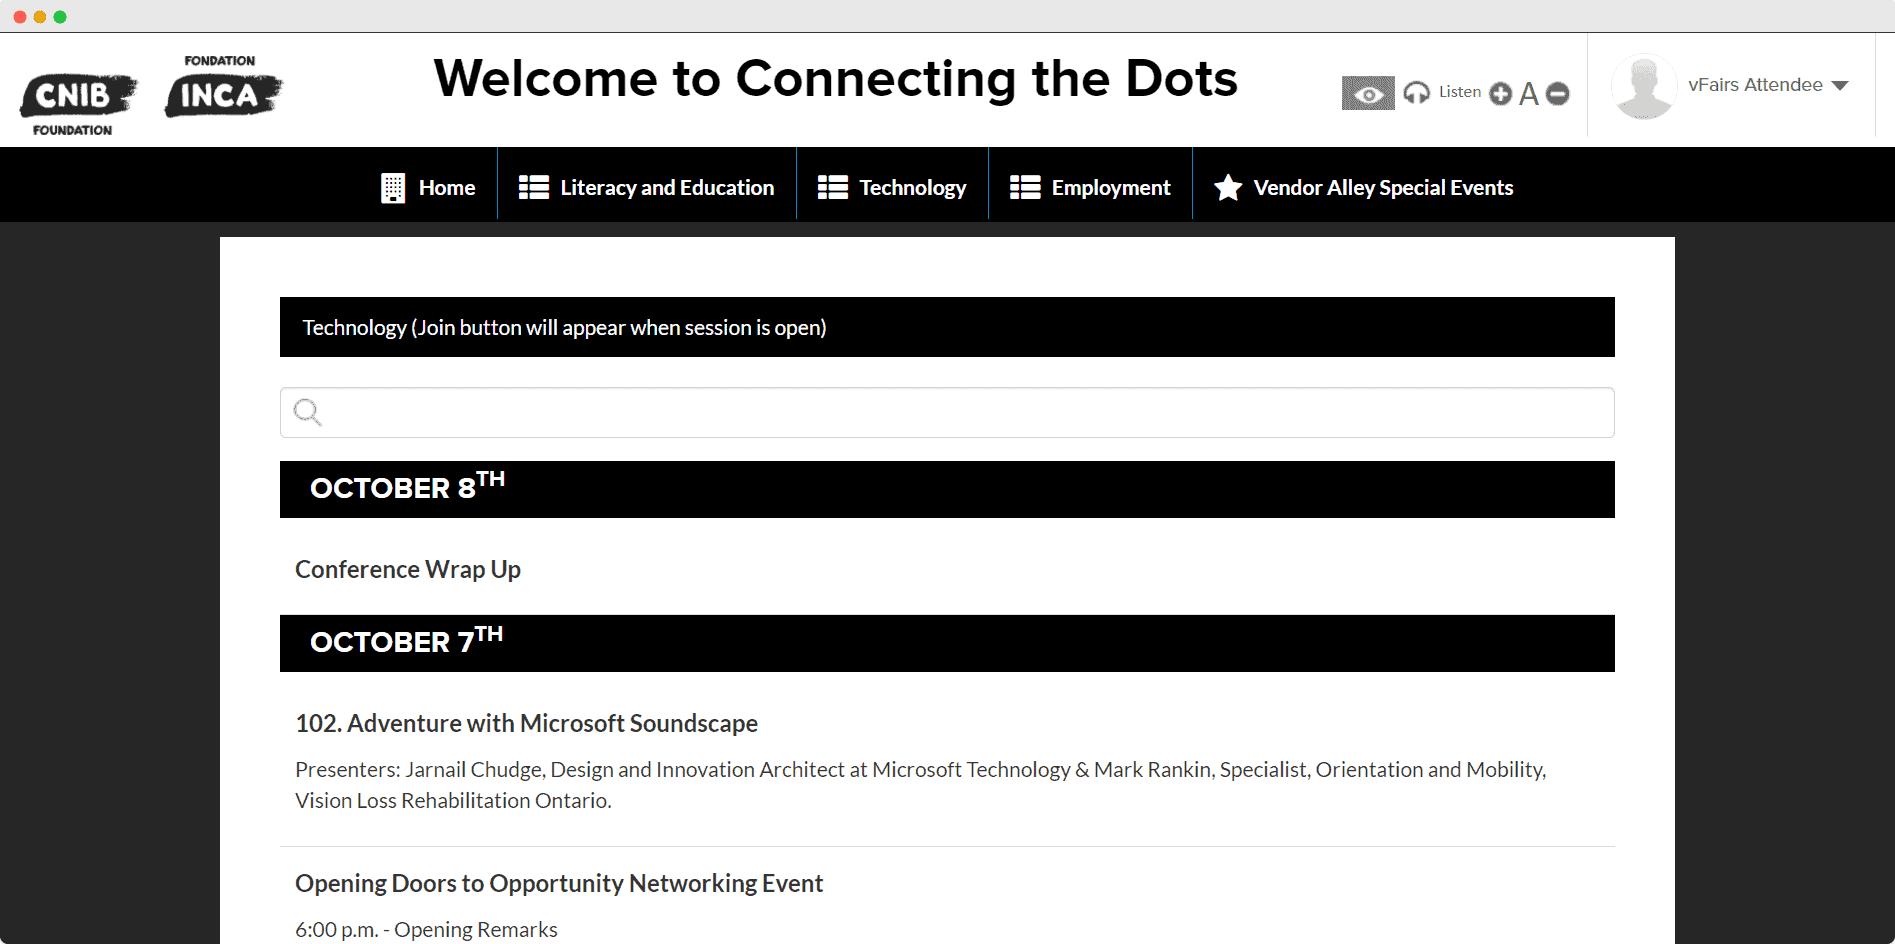 CNIB webinar page in virtual event